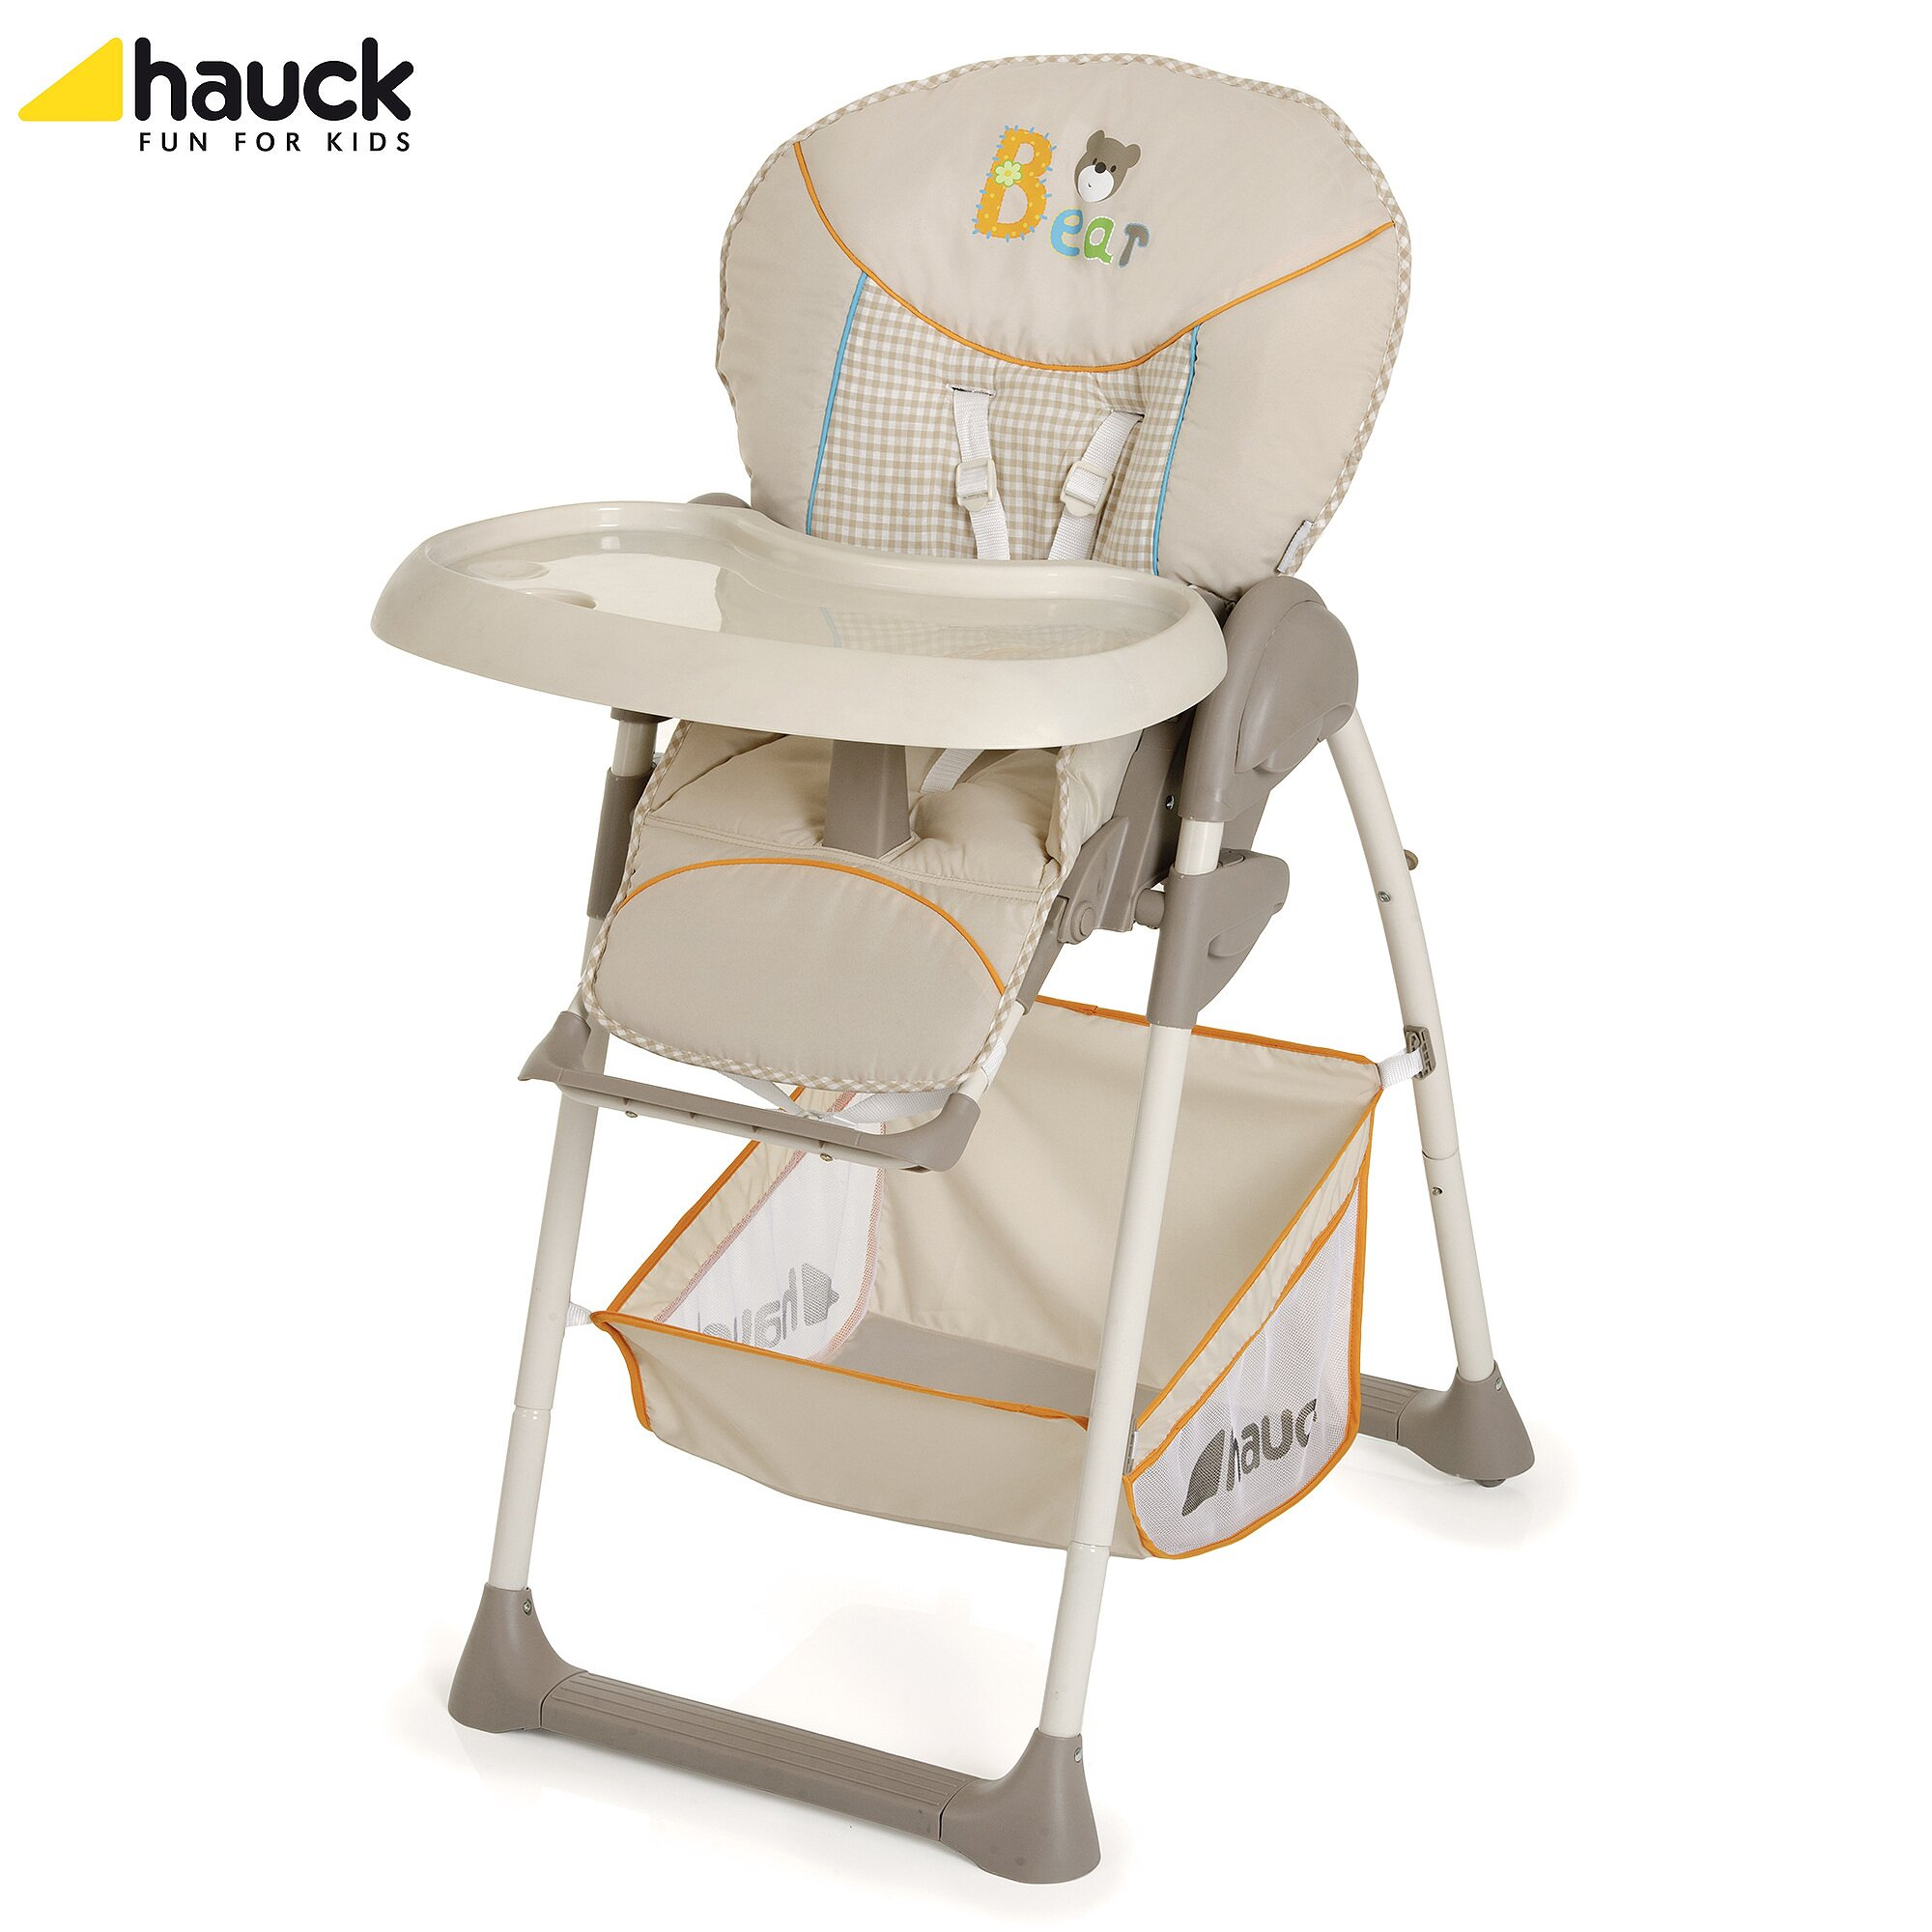 hauck-hochstuhl-sit-n-relax, 133.39 EUR @ babywalz-de